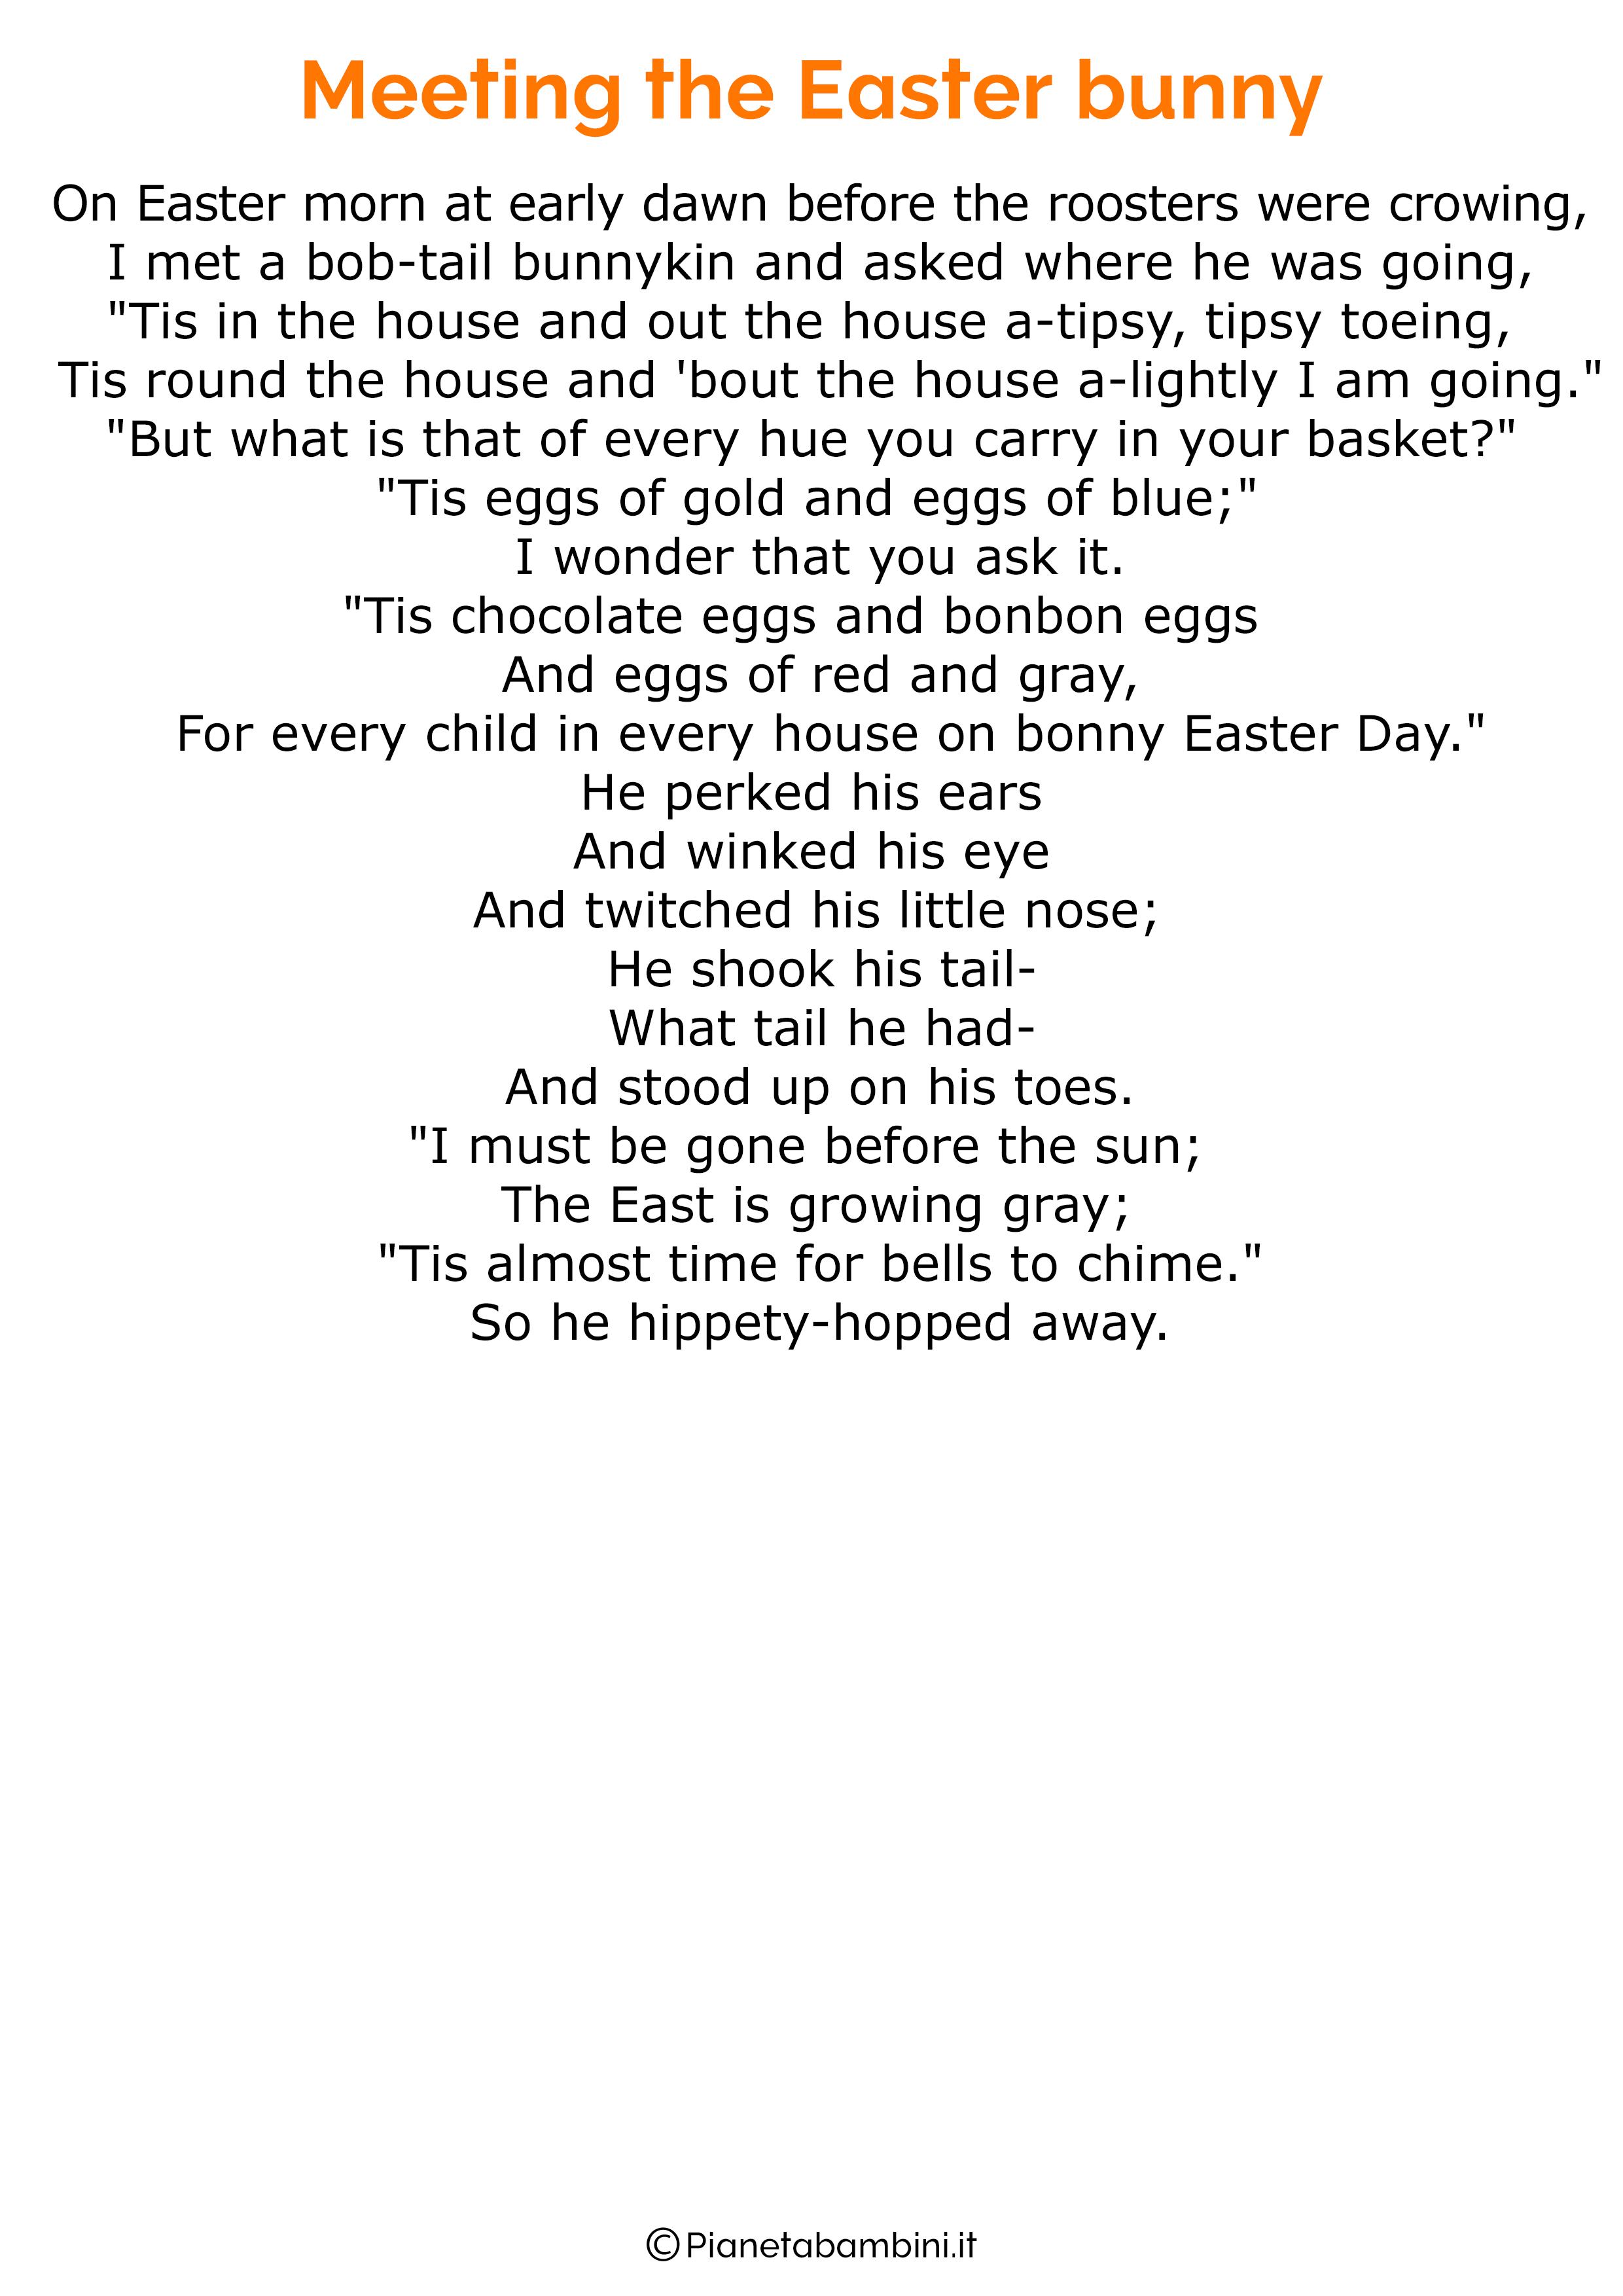 Poesie di Pasqua in inglese per bambini 25